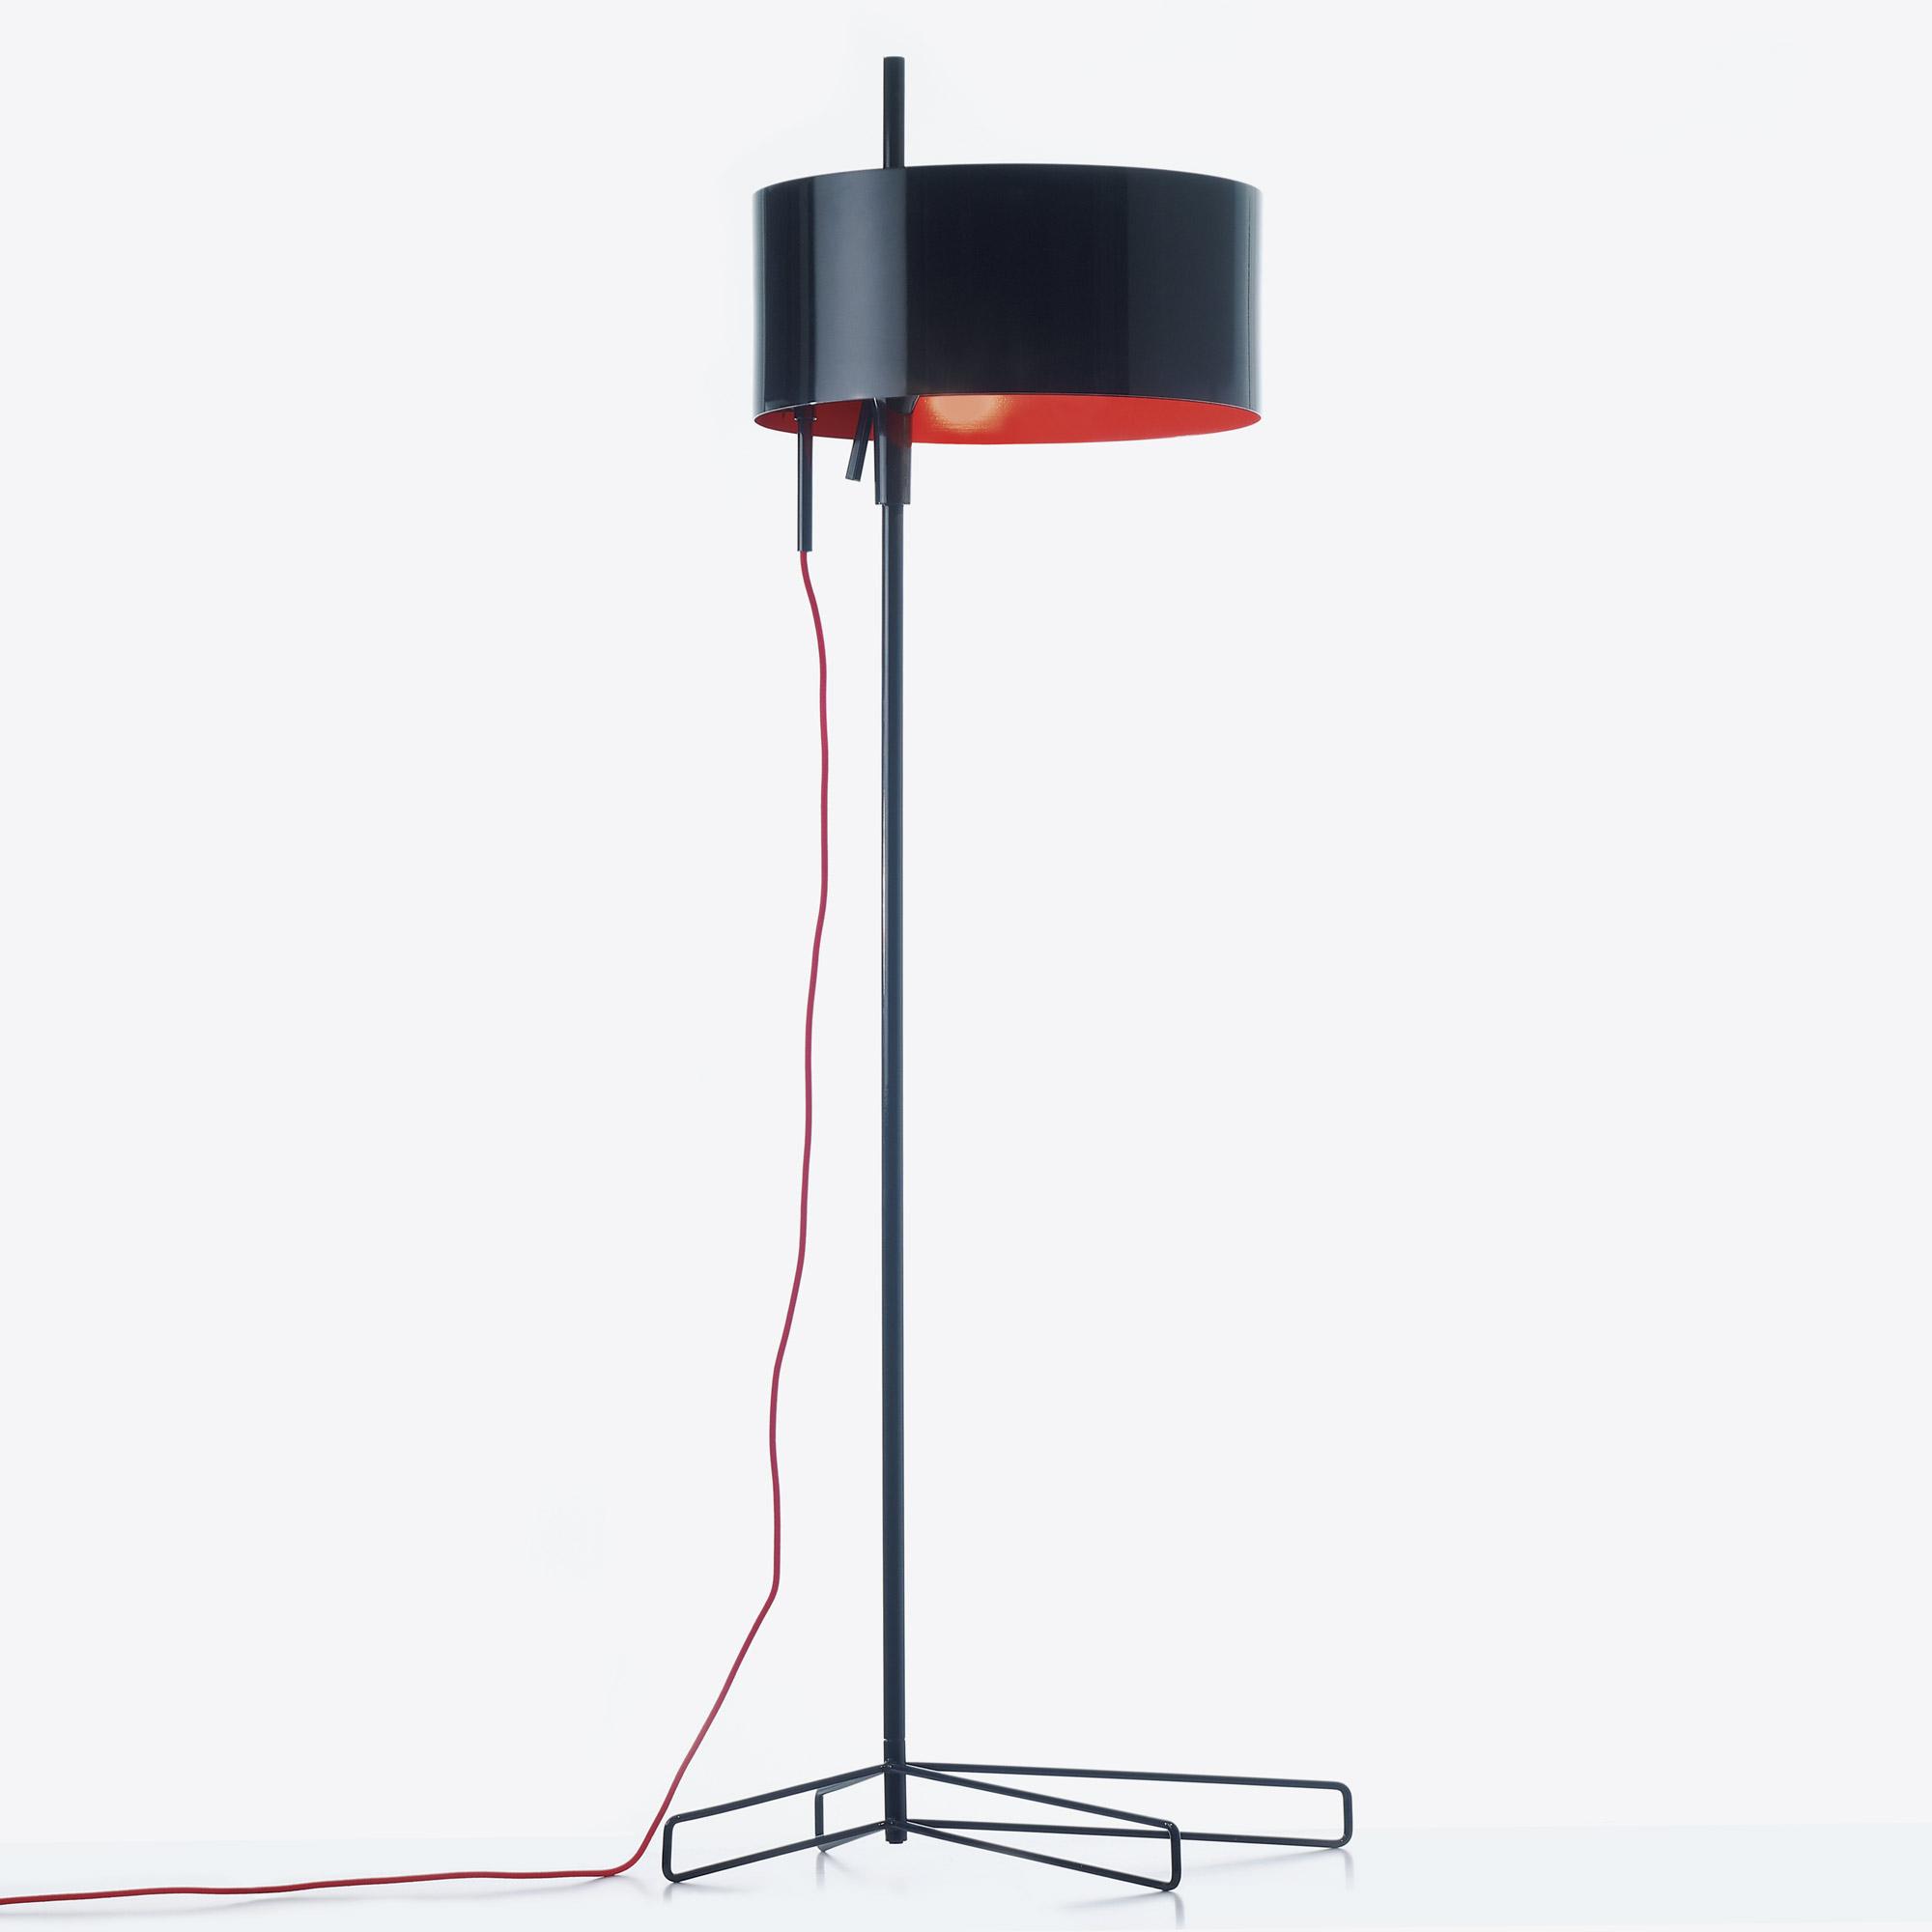 3G Lamp